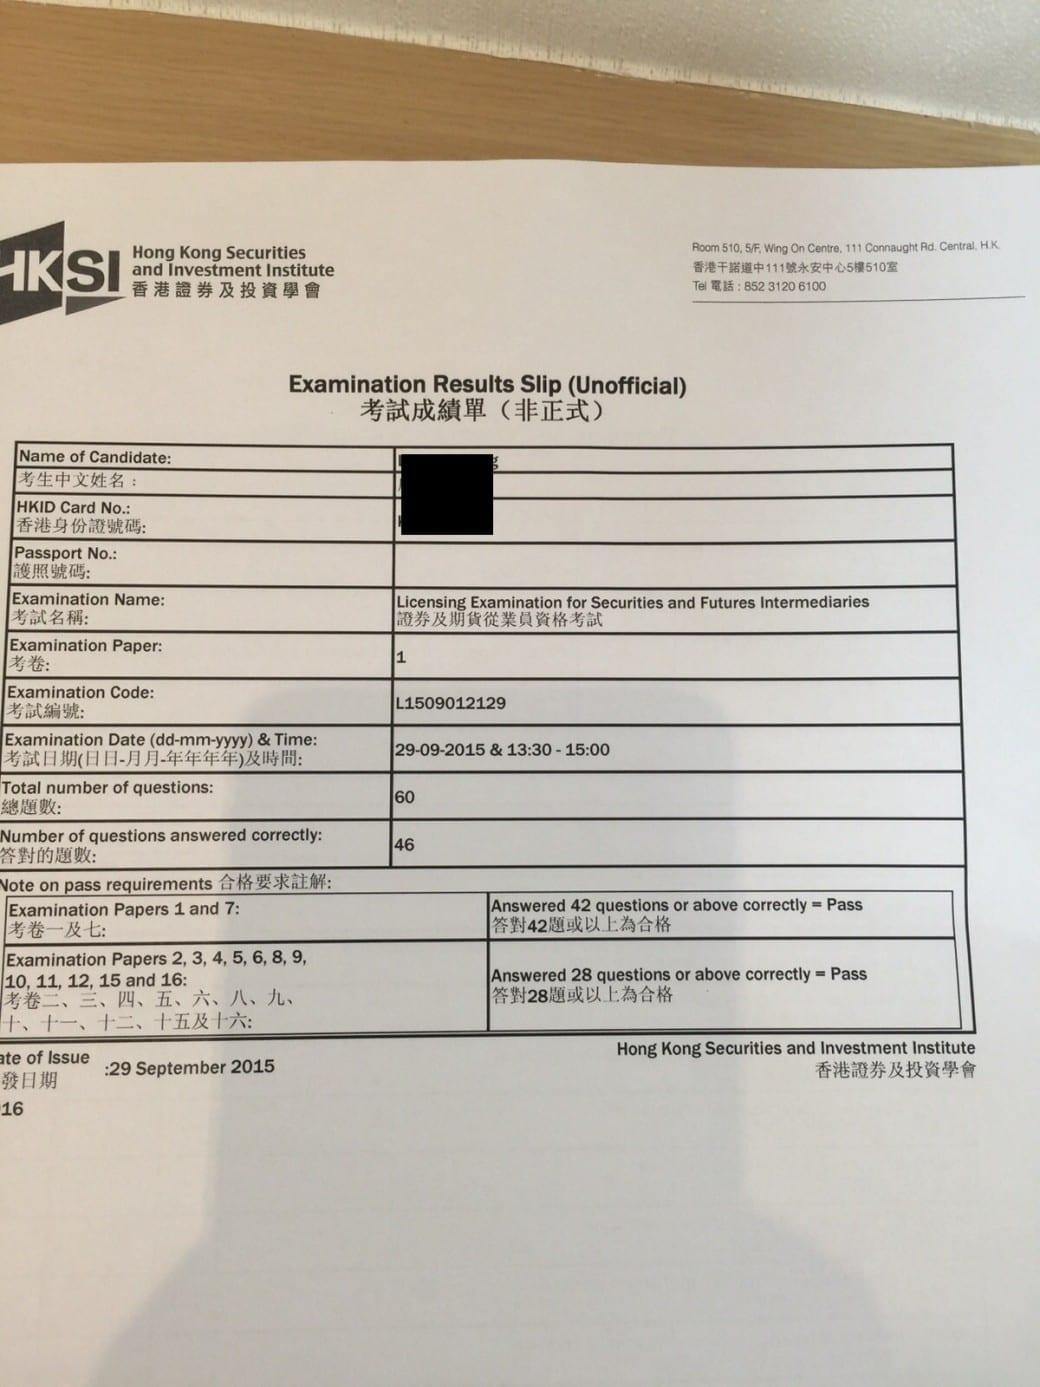 CarriaLiu 29/9/2015 HKSI Paper 1 Pass